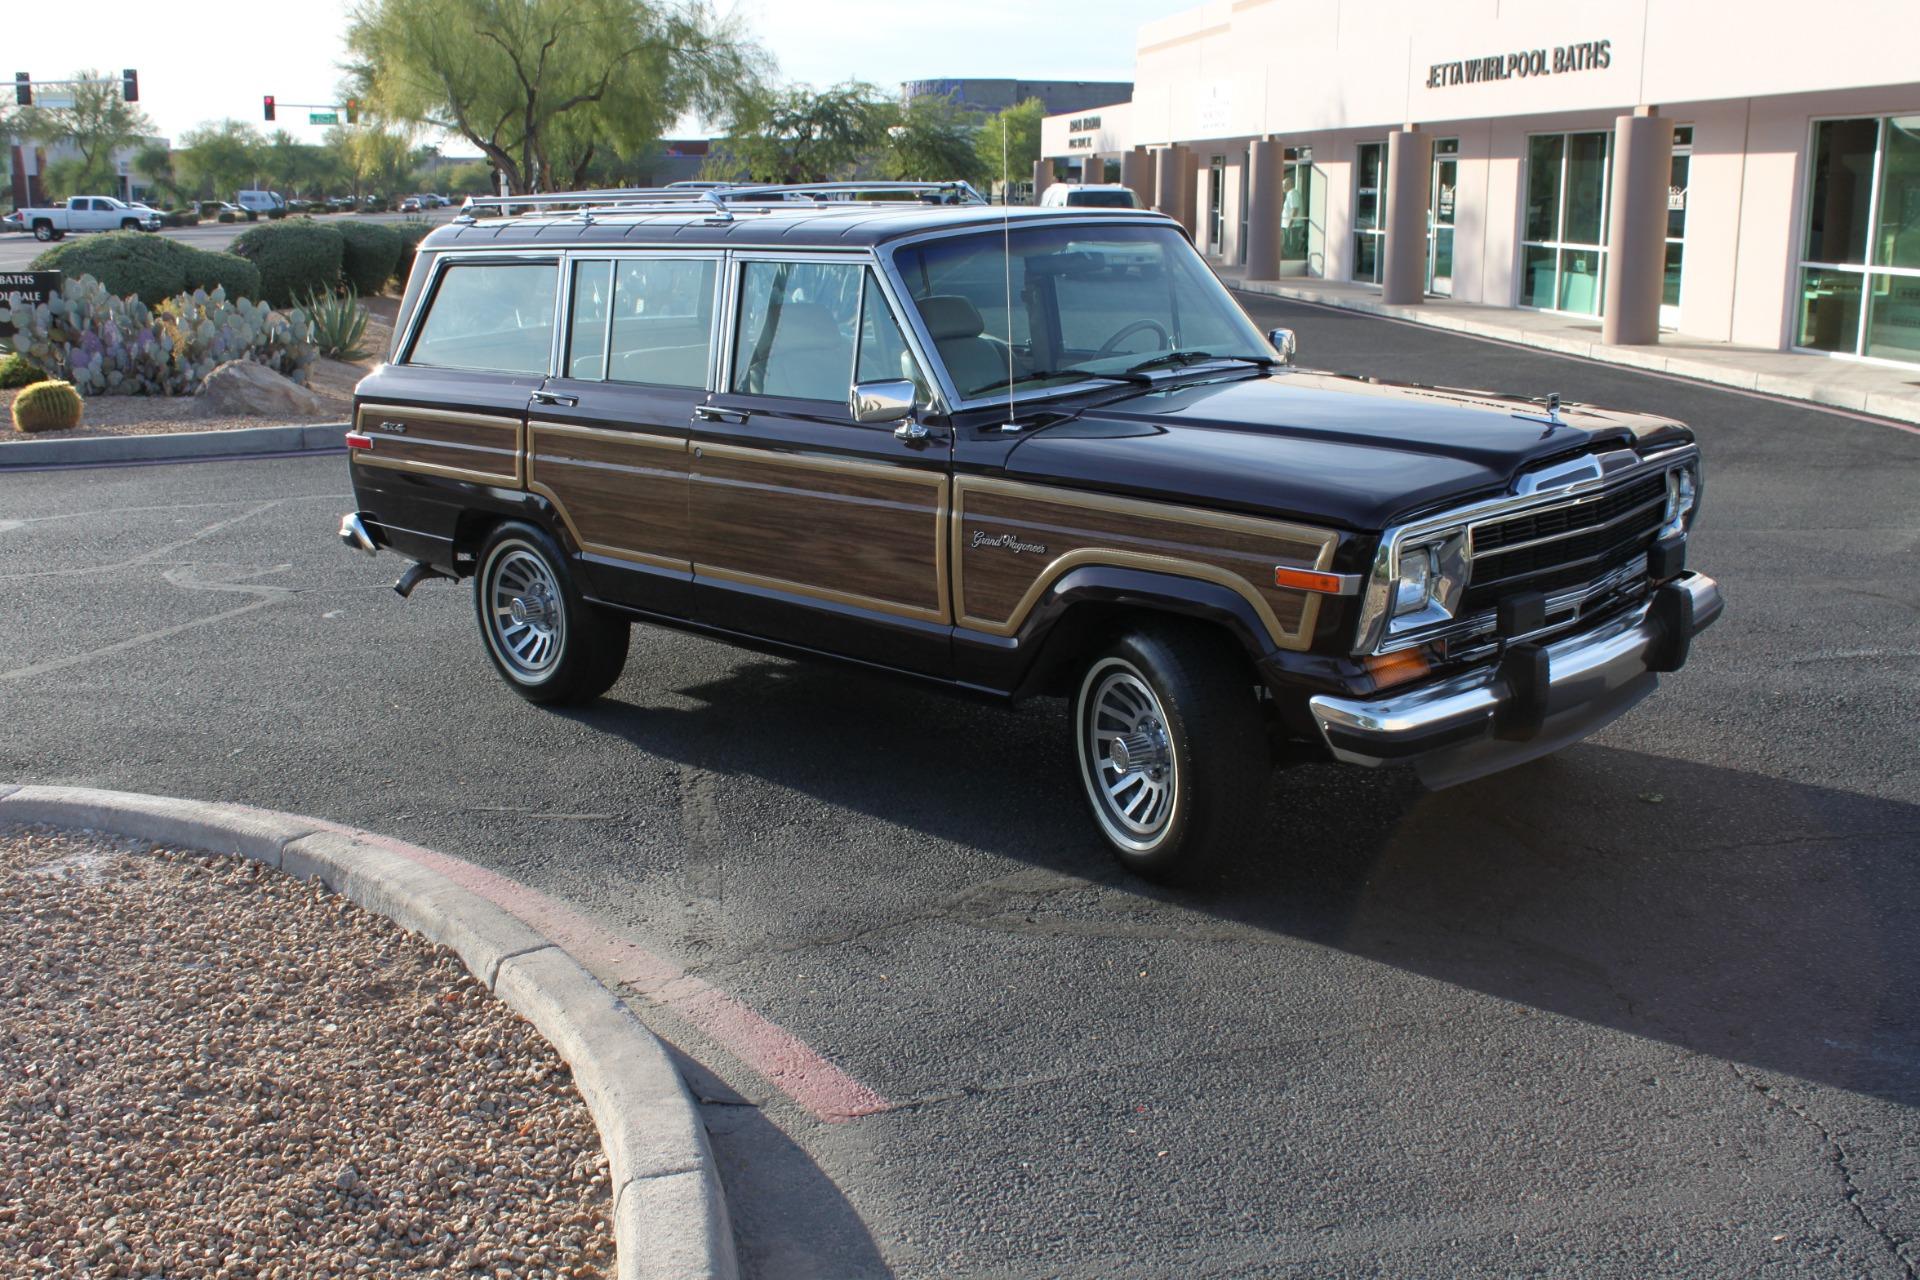 Used-1990-Jeep-Grand-Wagoneer-4X4-Chevrolet